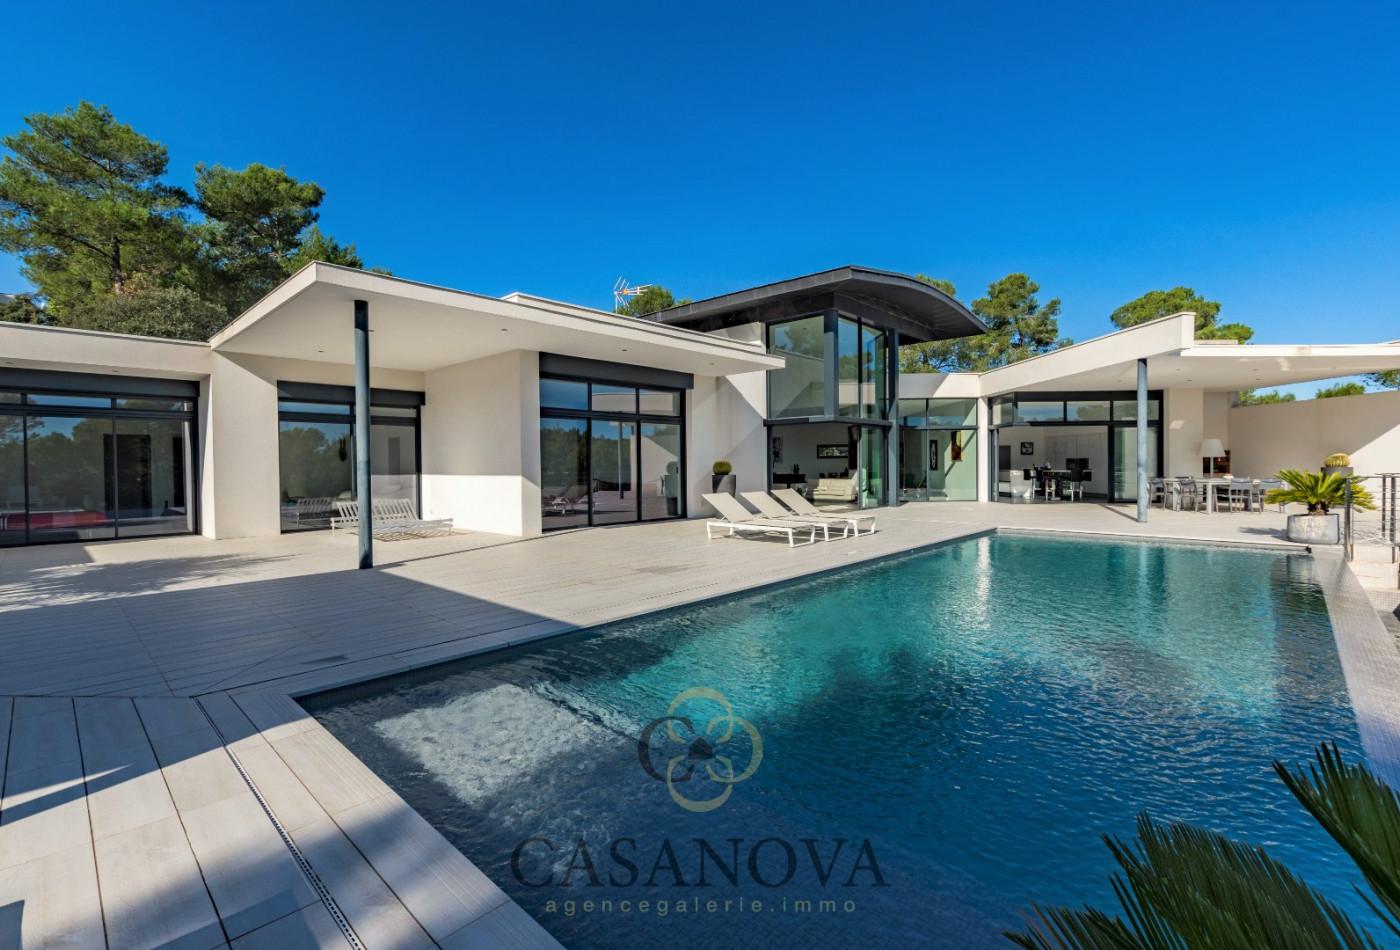 A vendre Montpellier 340148242 Agence galerie casanova